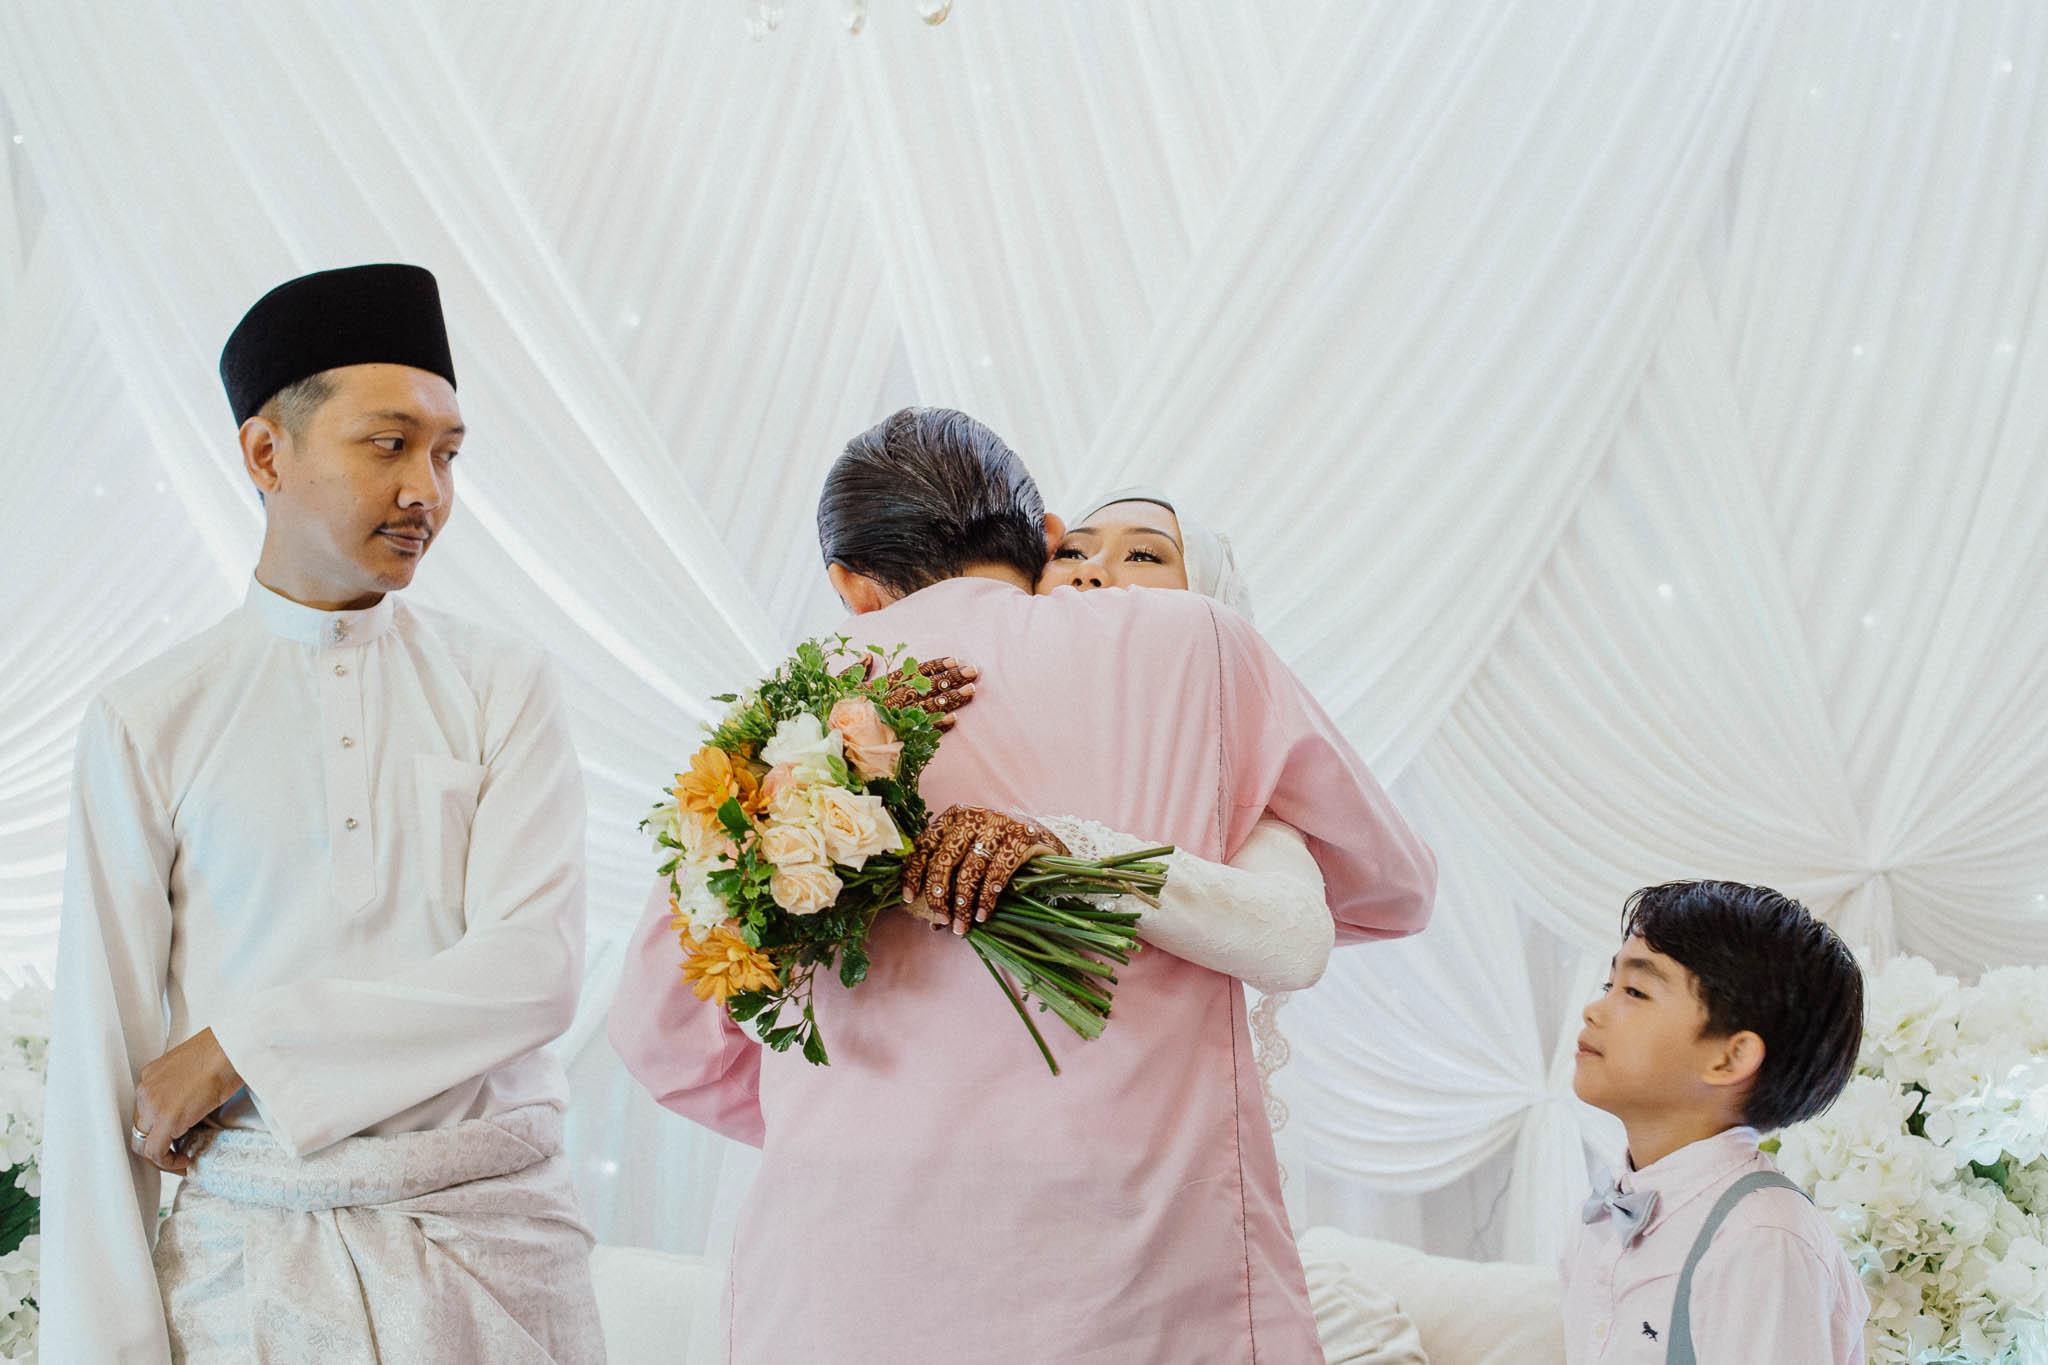 singapore-wedding-photographer-addafiq-nufail-030.jpg